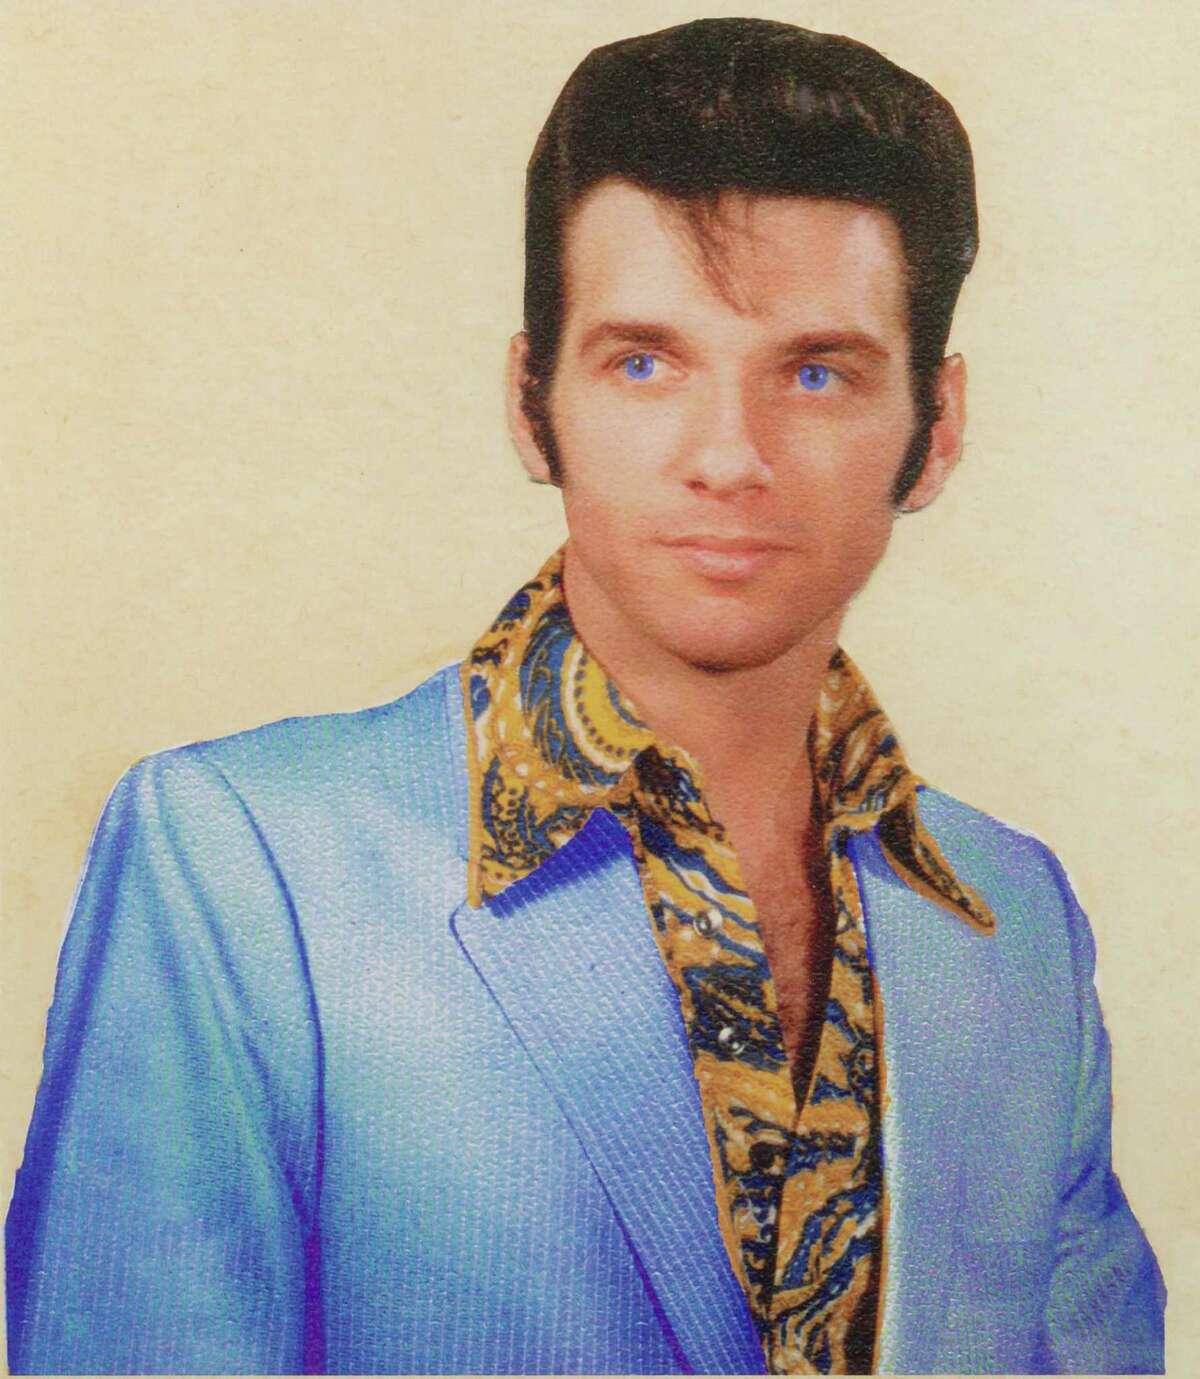 A publicity photo of Dino De Cherro circa 1976-77 that was later used on the sleeve of De Cherro's self-released single of 1977,